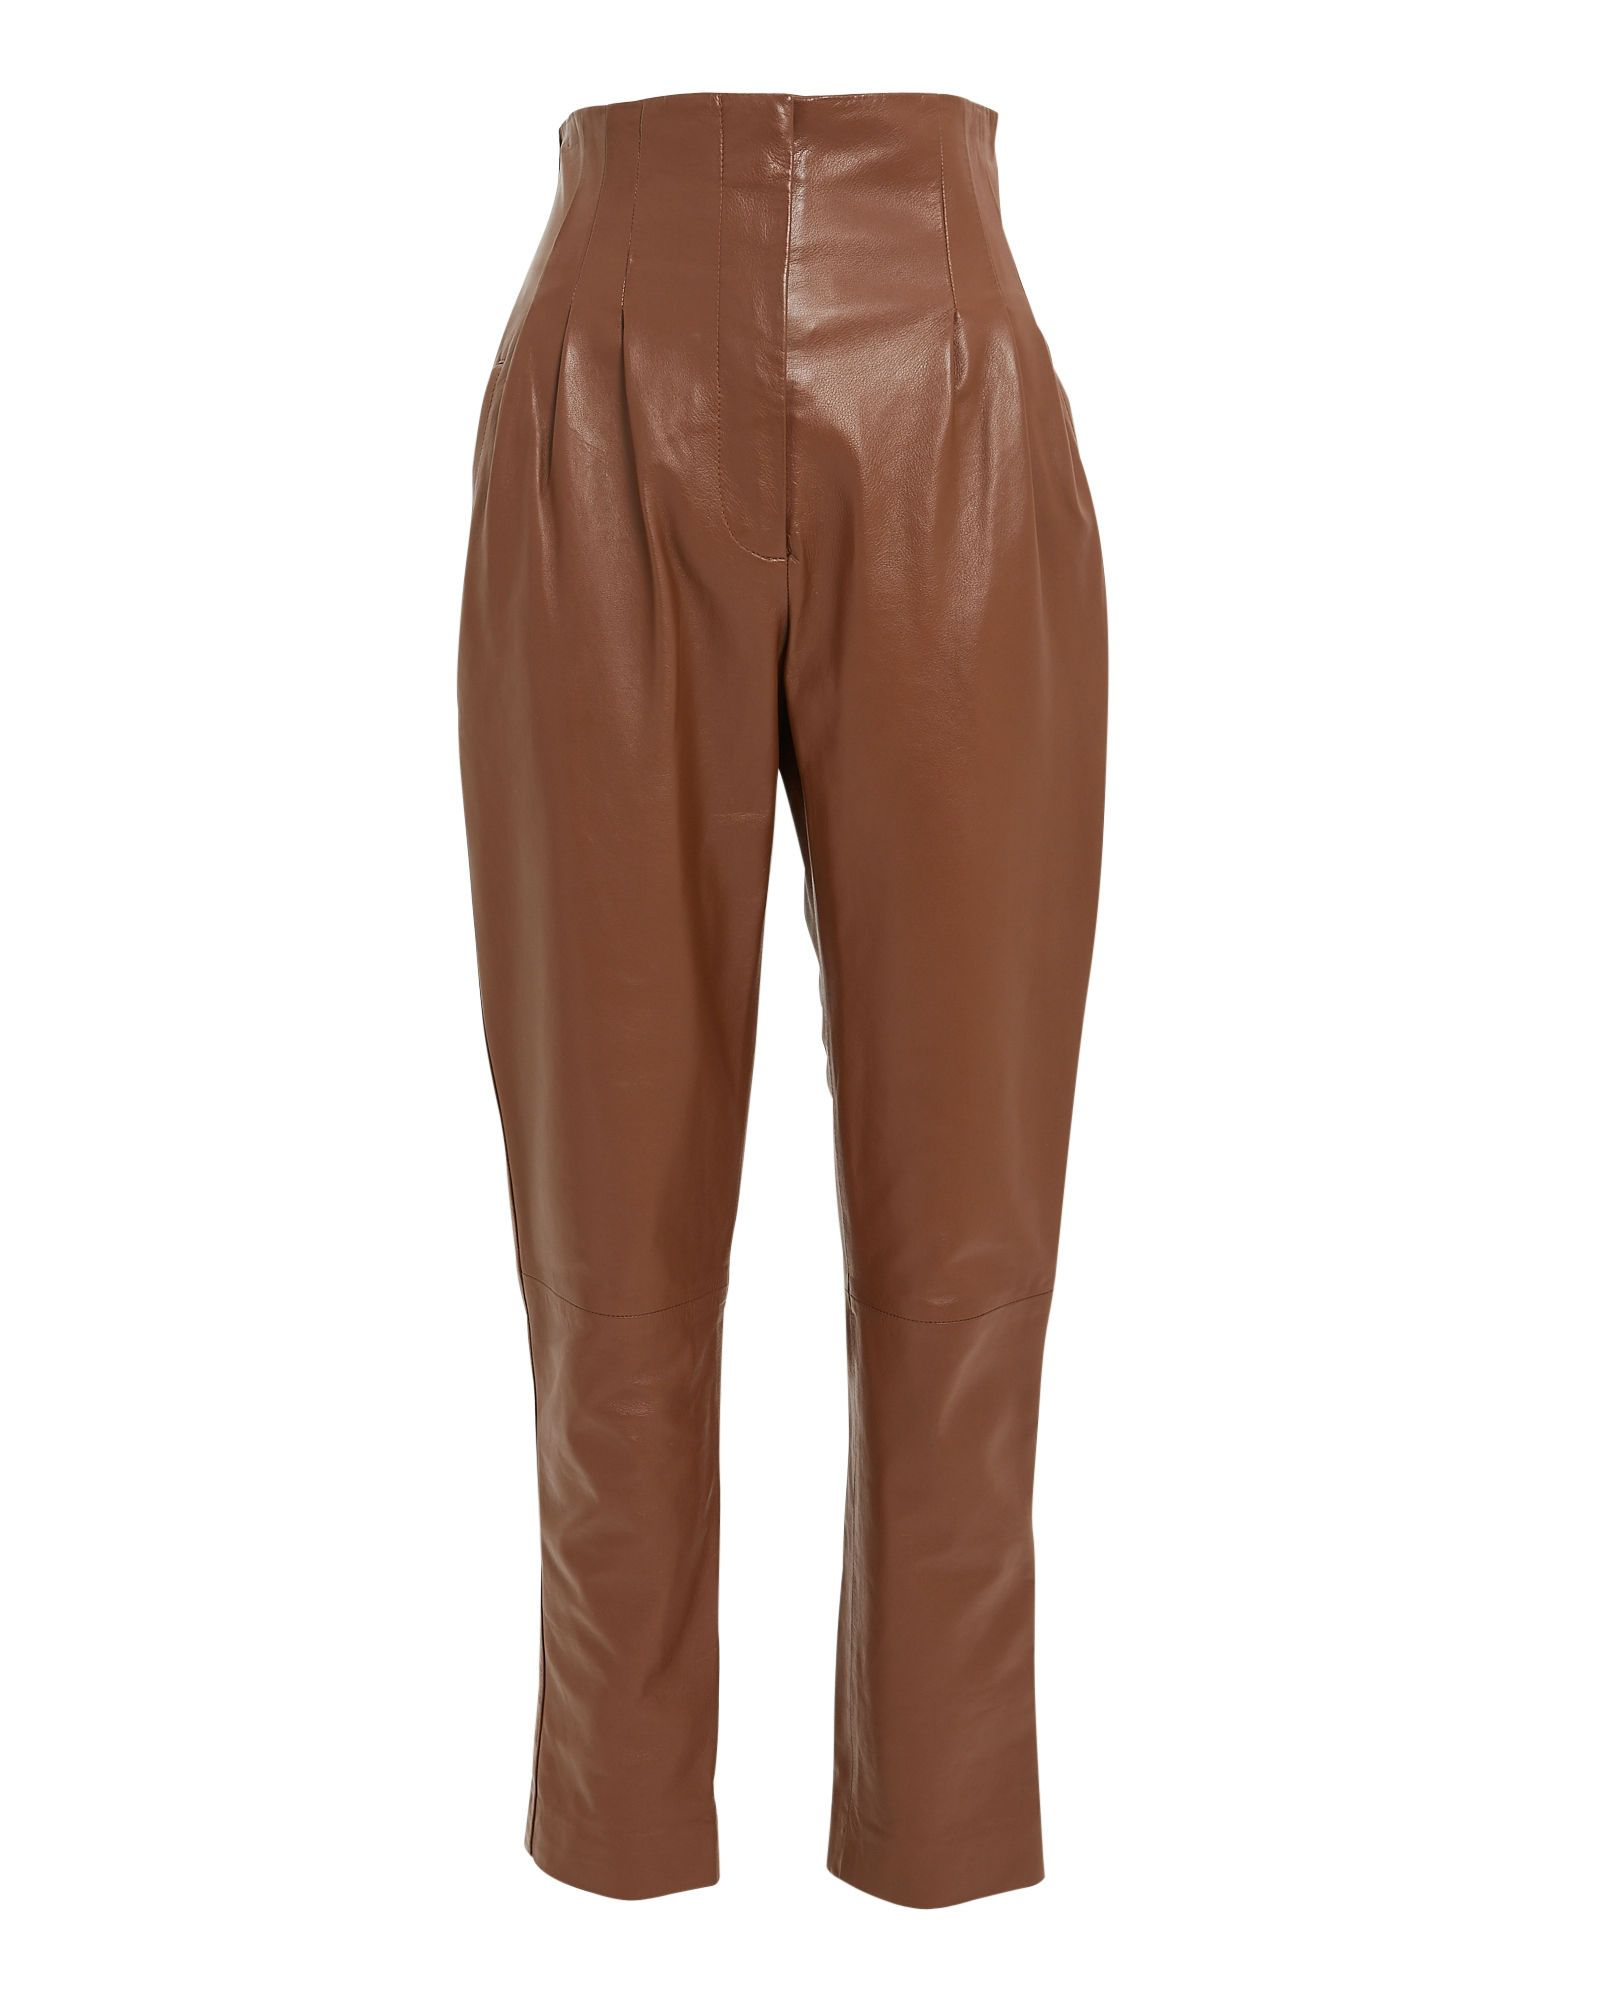 c6425df0eab69 High Waist Leather Tapered Pants